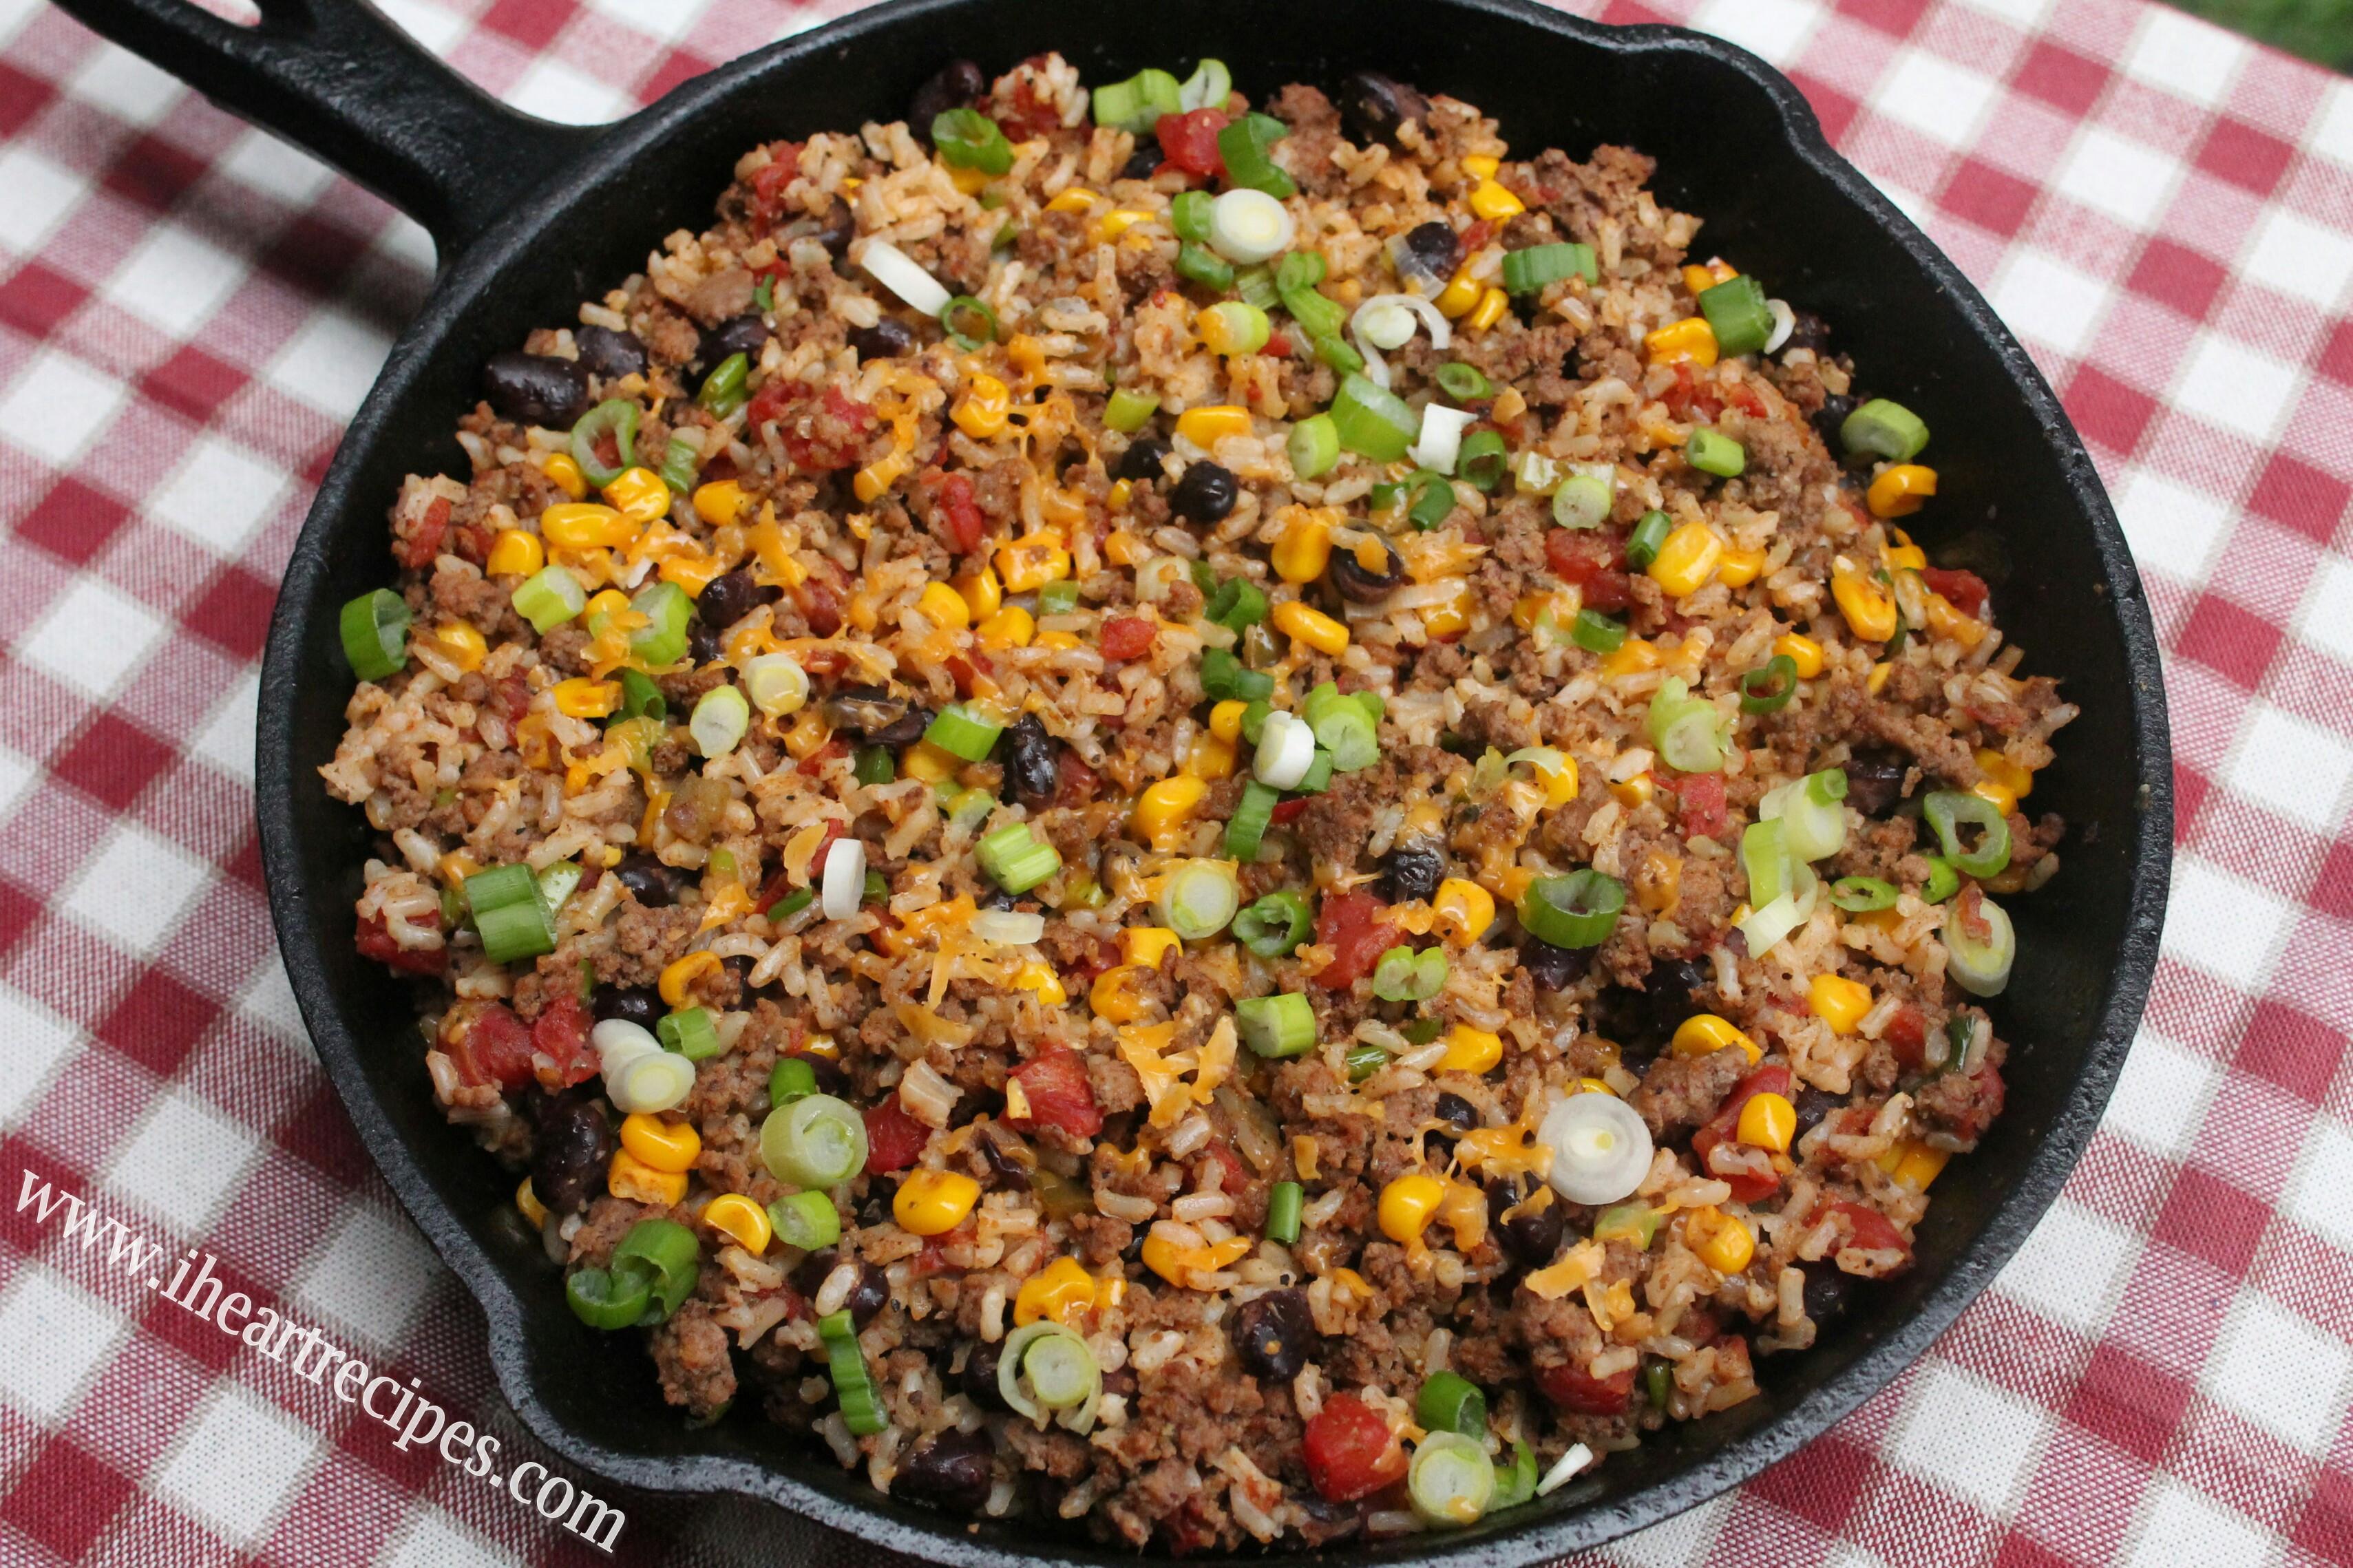 Healthy Ground Beef Skillet Recipes  Tex Mex Ground Beef Skillet I Heart Recipes